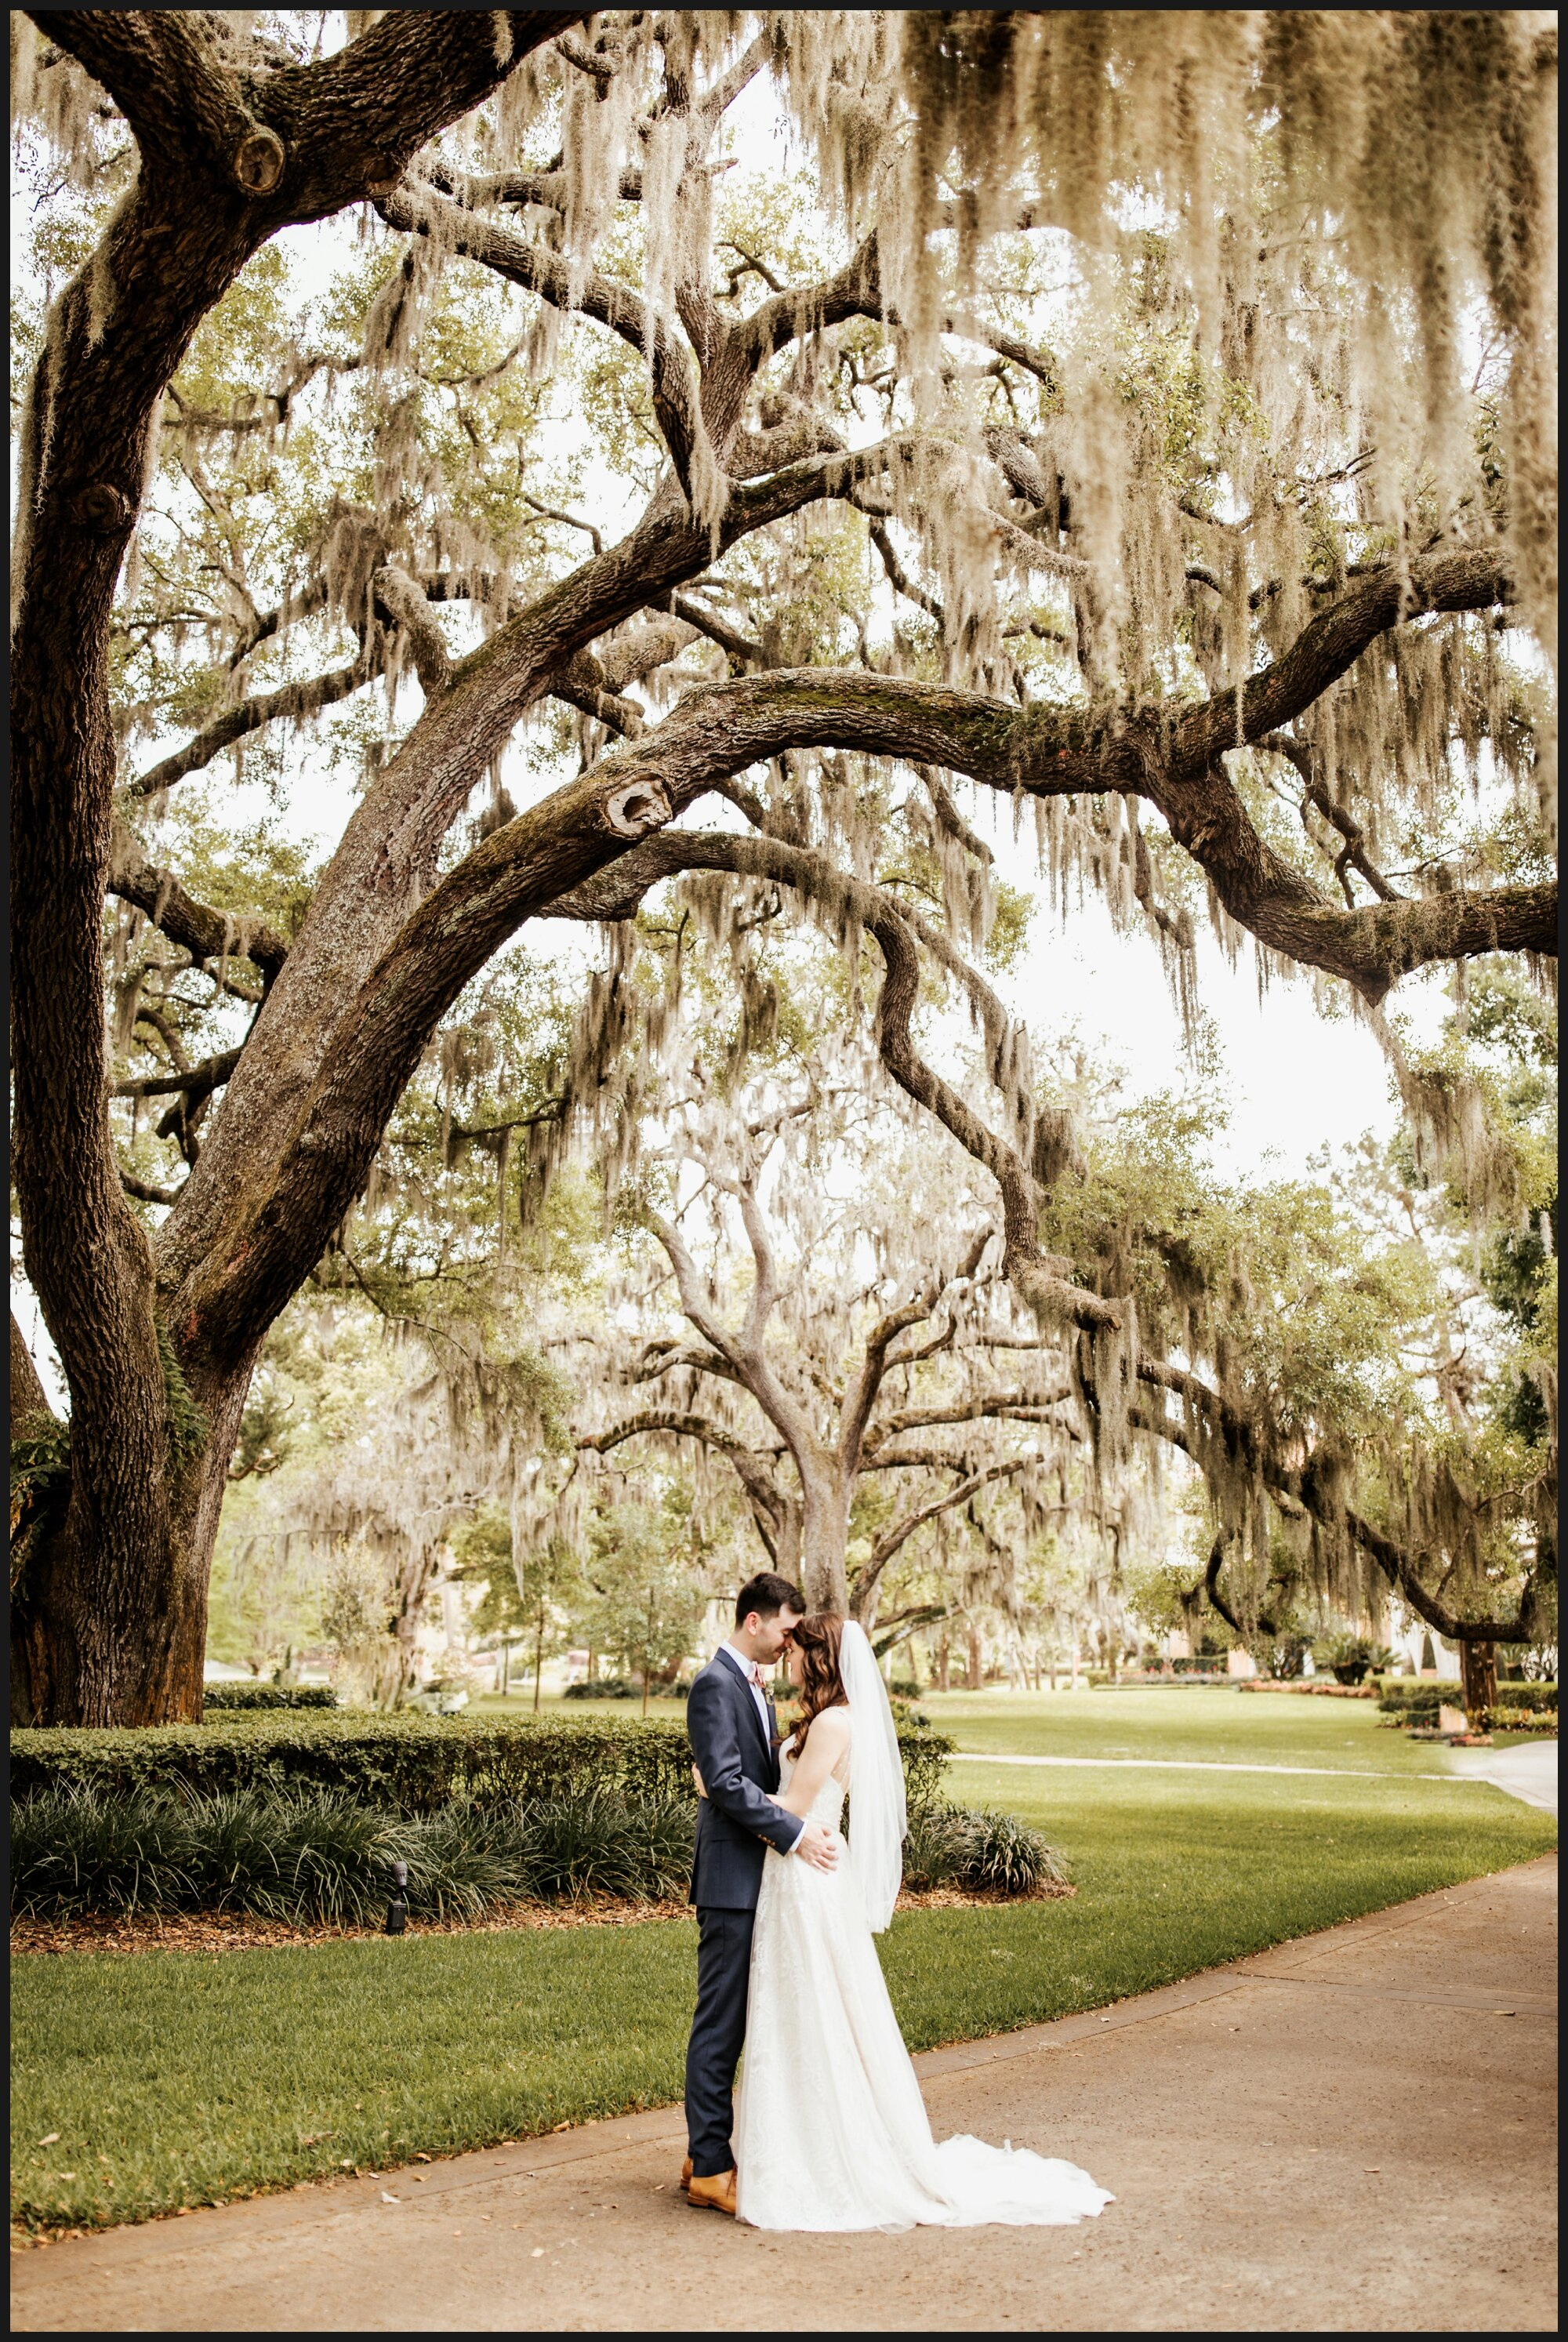 Orlando-Wedding-Photographer-destination-wedding-photographer-florida-wedding-photographer-hawaii-wedding-photographer_0669.jpg